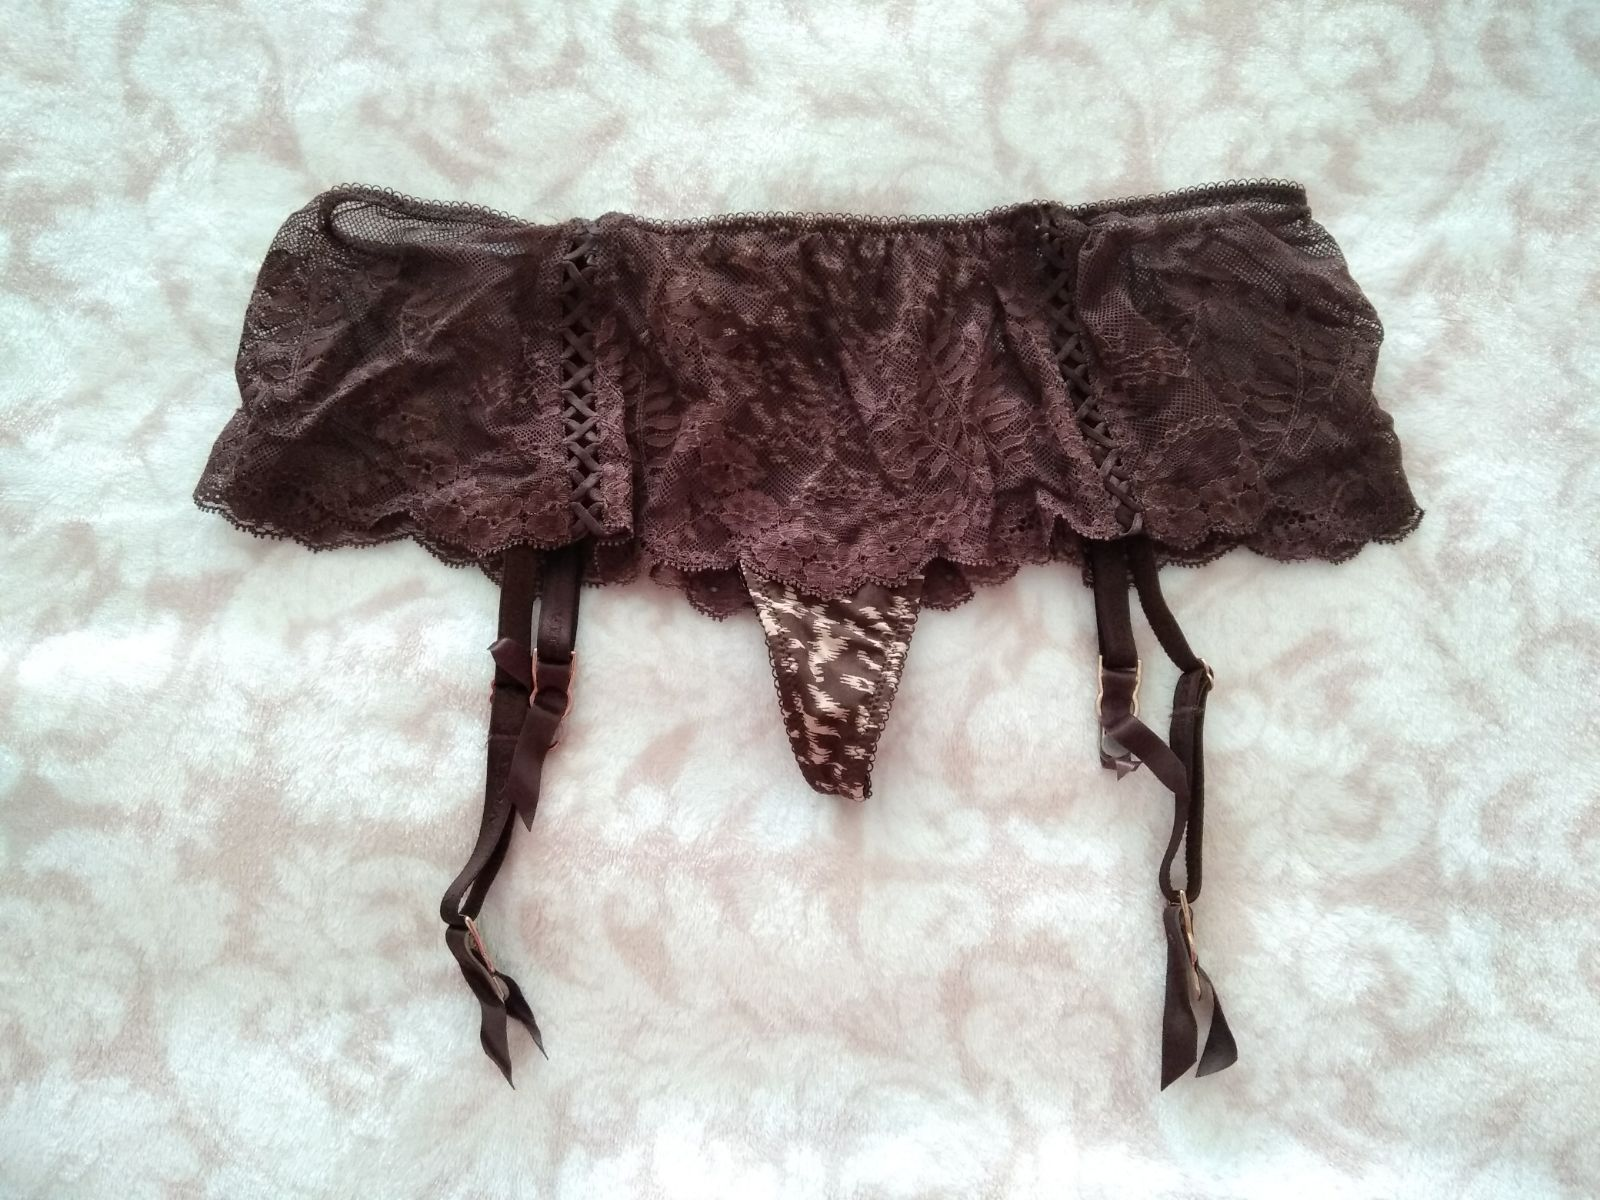 NEW (S) VS Garter belt thong in brown